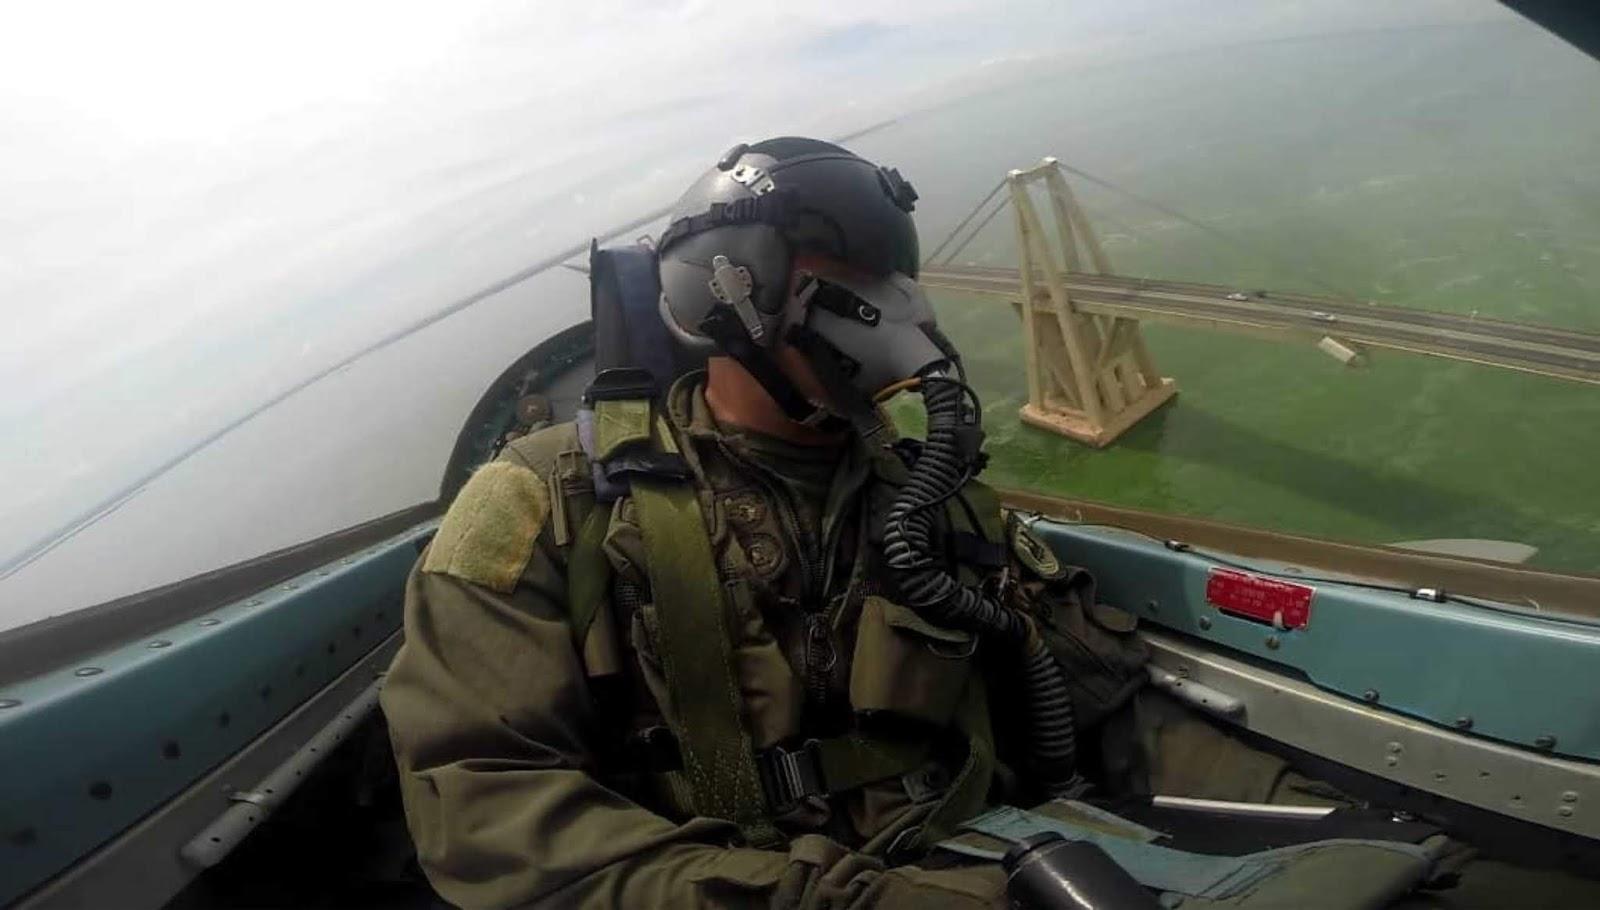 Venezuela akan mengadu ke PBB tentang invasi pesawat AS